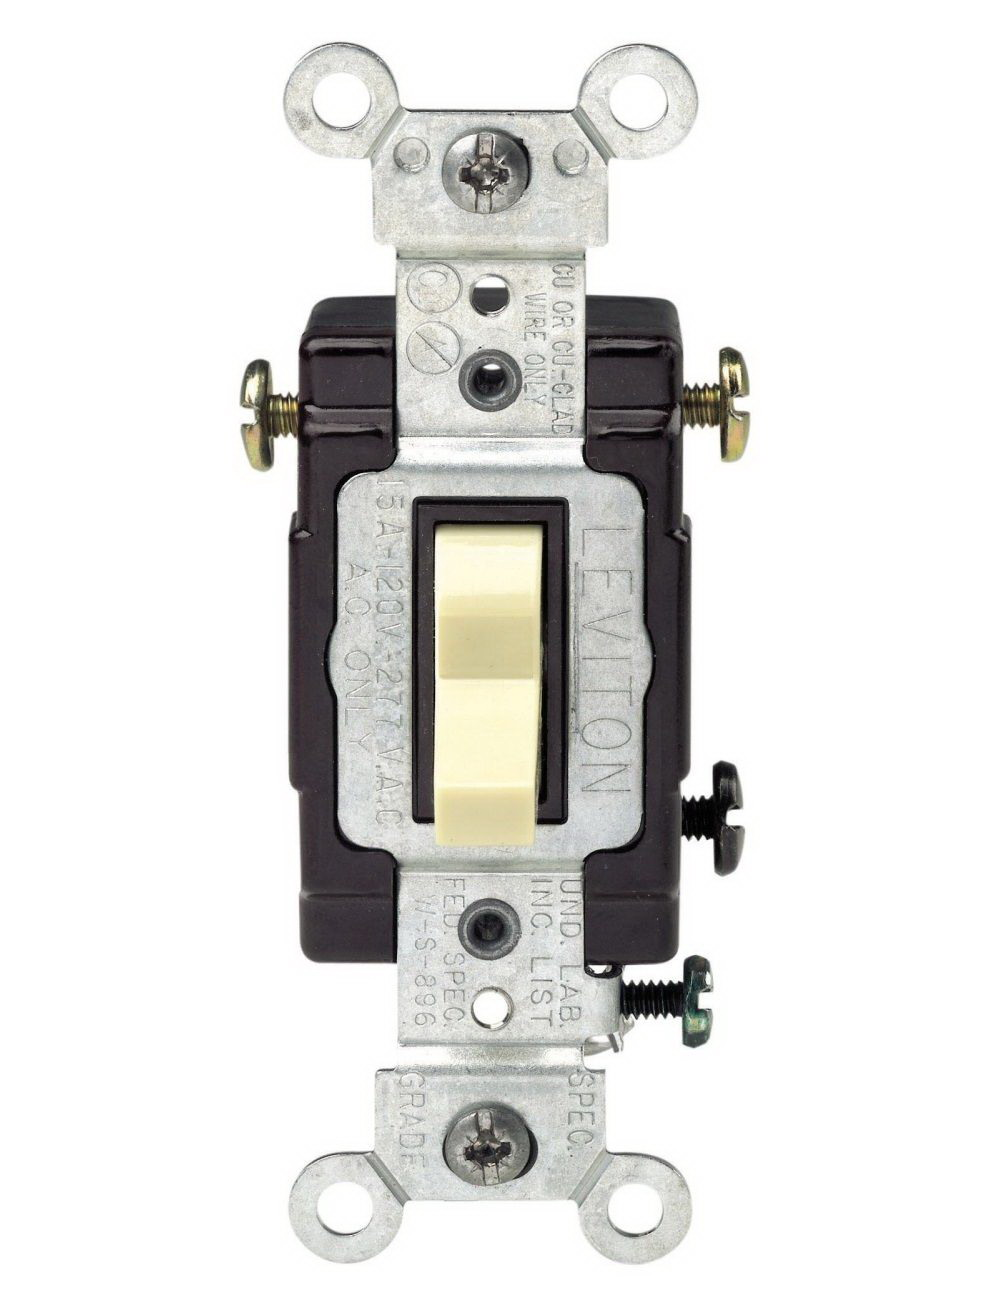 Leviton C21-05503-LHI Grounded Toggle Switch, 120 VAC, 15 A, Ivory